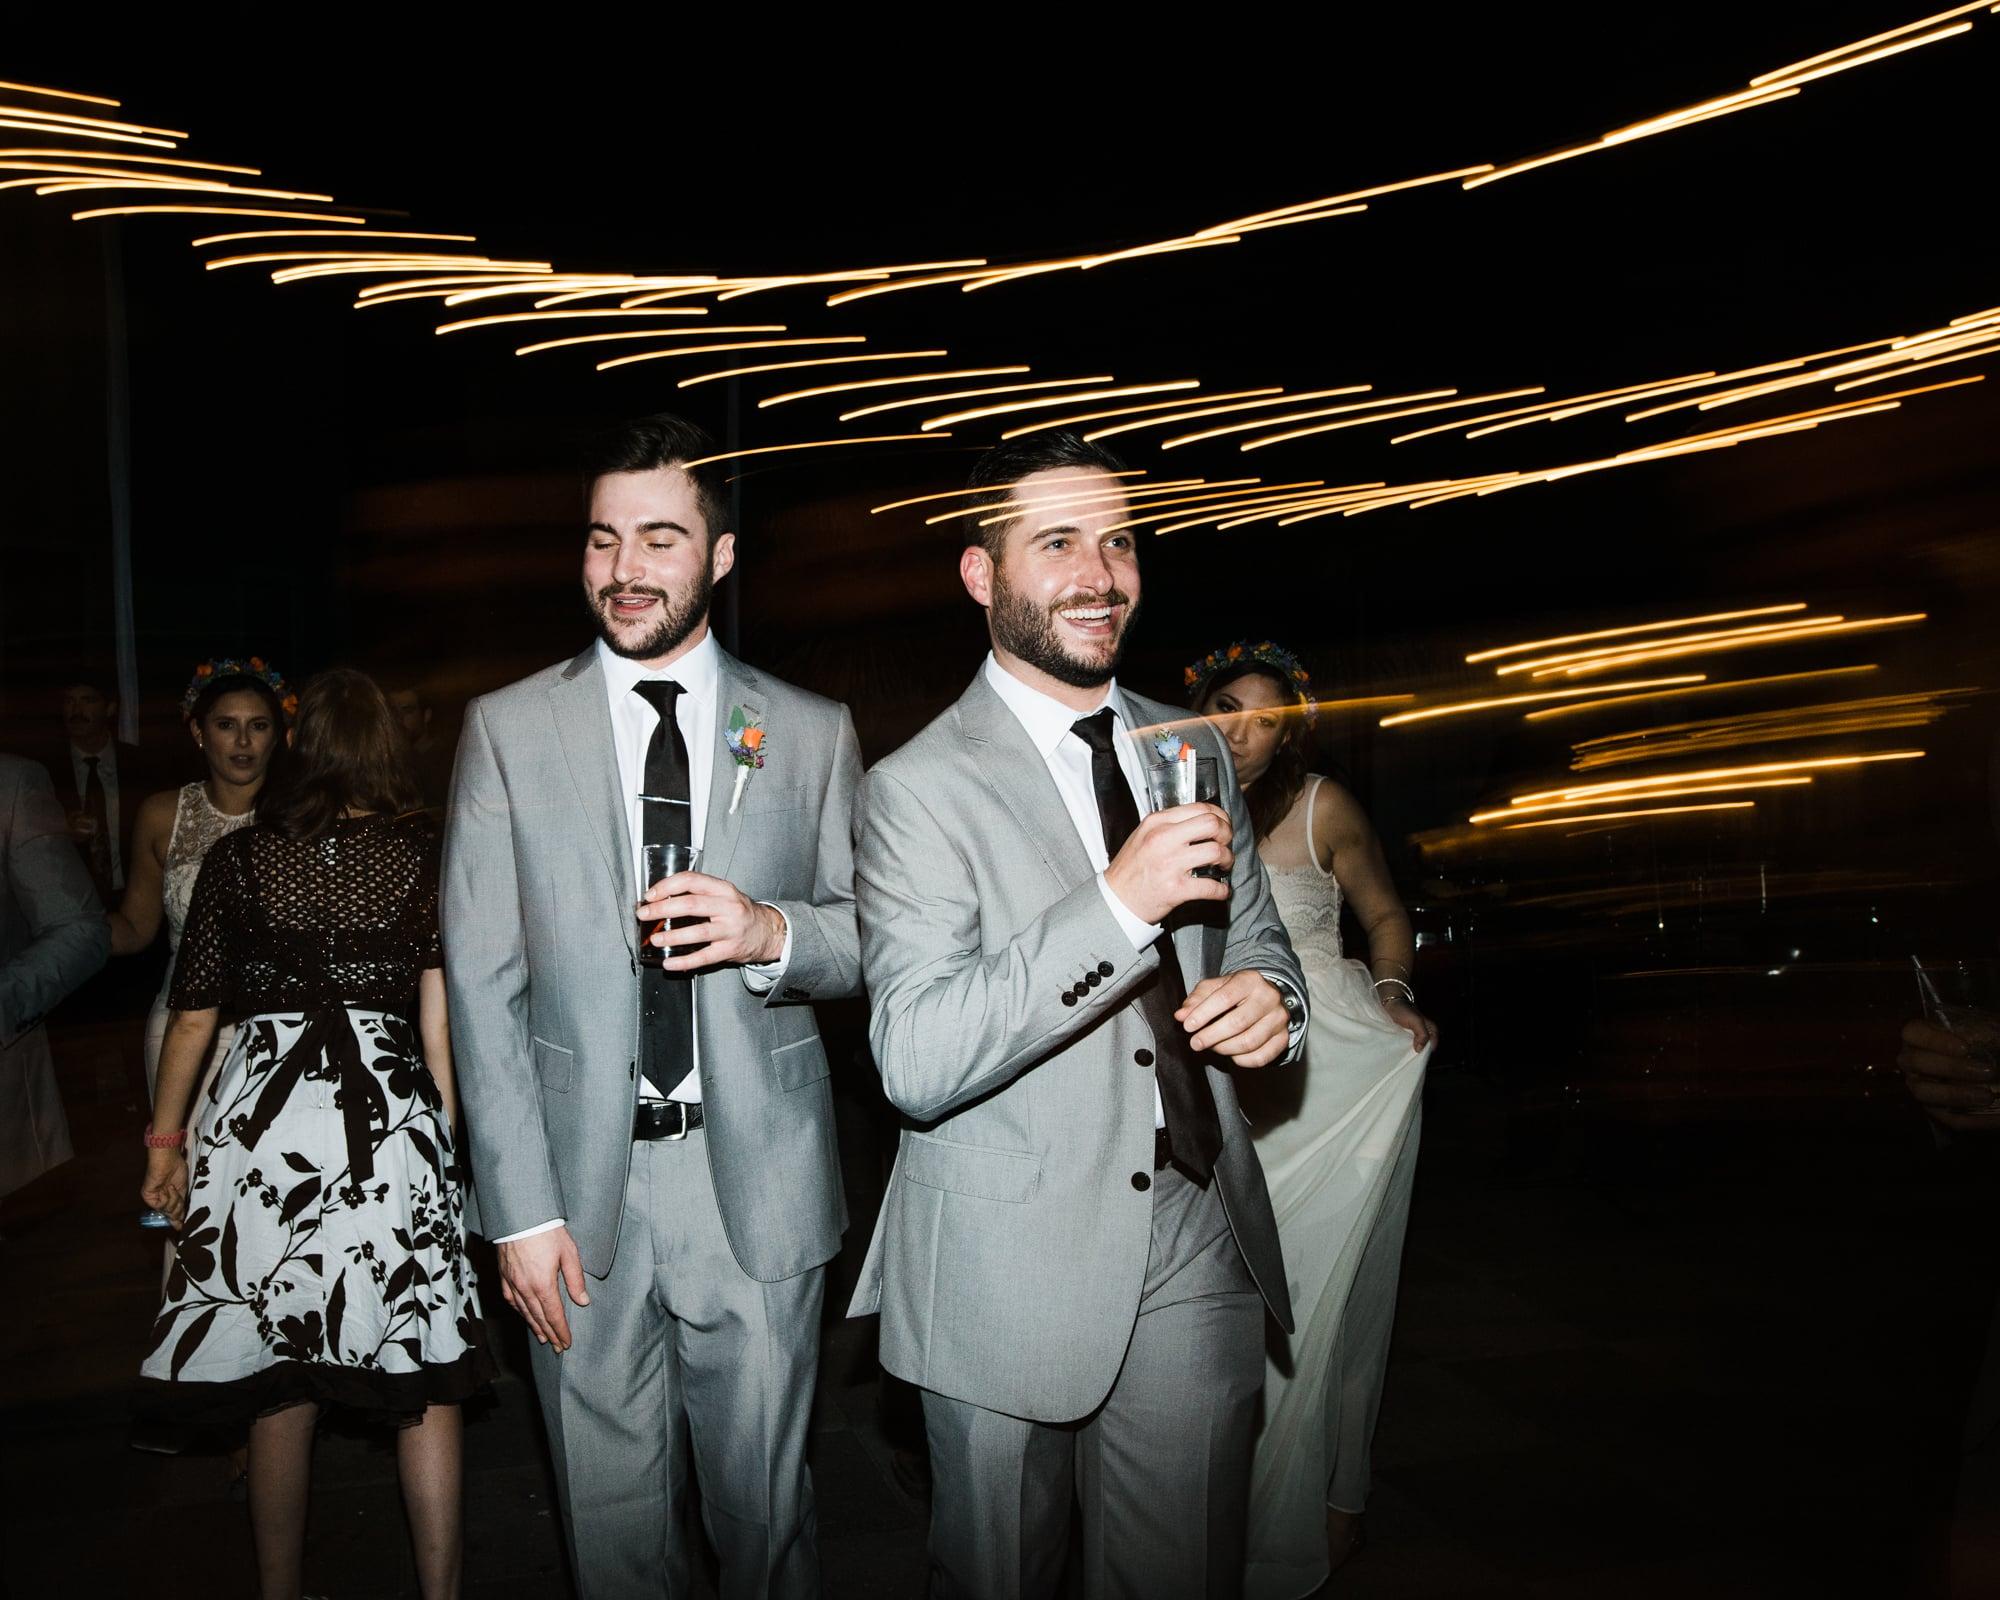 ©Isaiah & Taylor Photography - The Elms Mansion Wedding - New Orleans, Louisiana-79.jpg